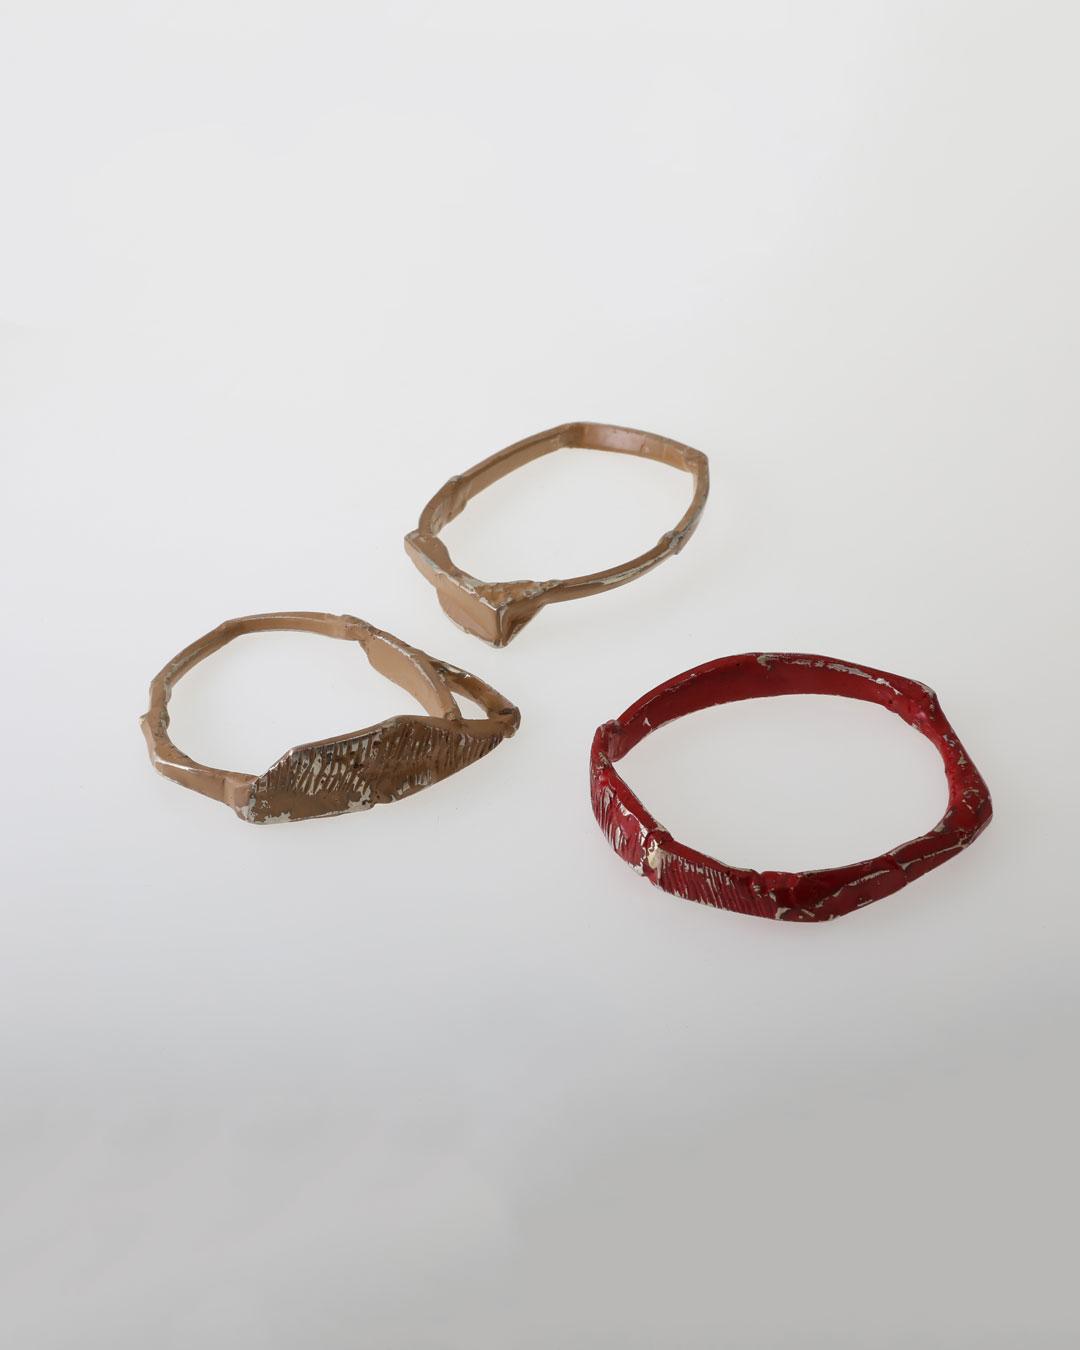 Rudolf Kocéa, Match Match Match, 2018, bracelet; silver, paint, ø 70 mm, €750 each